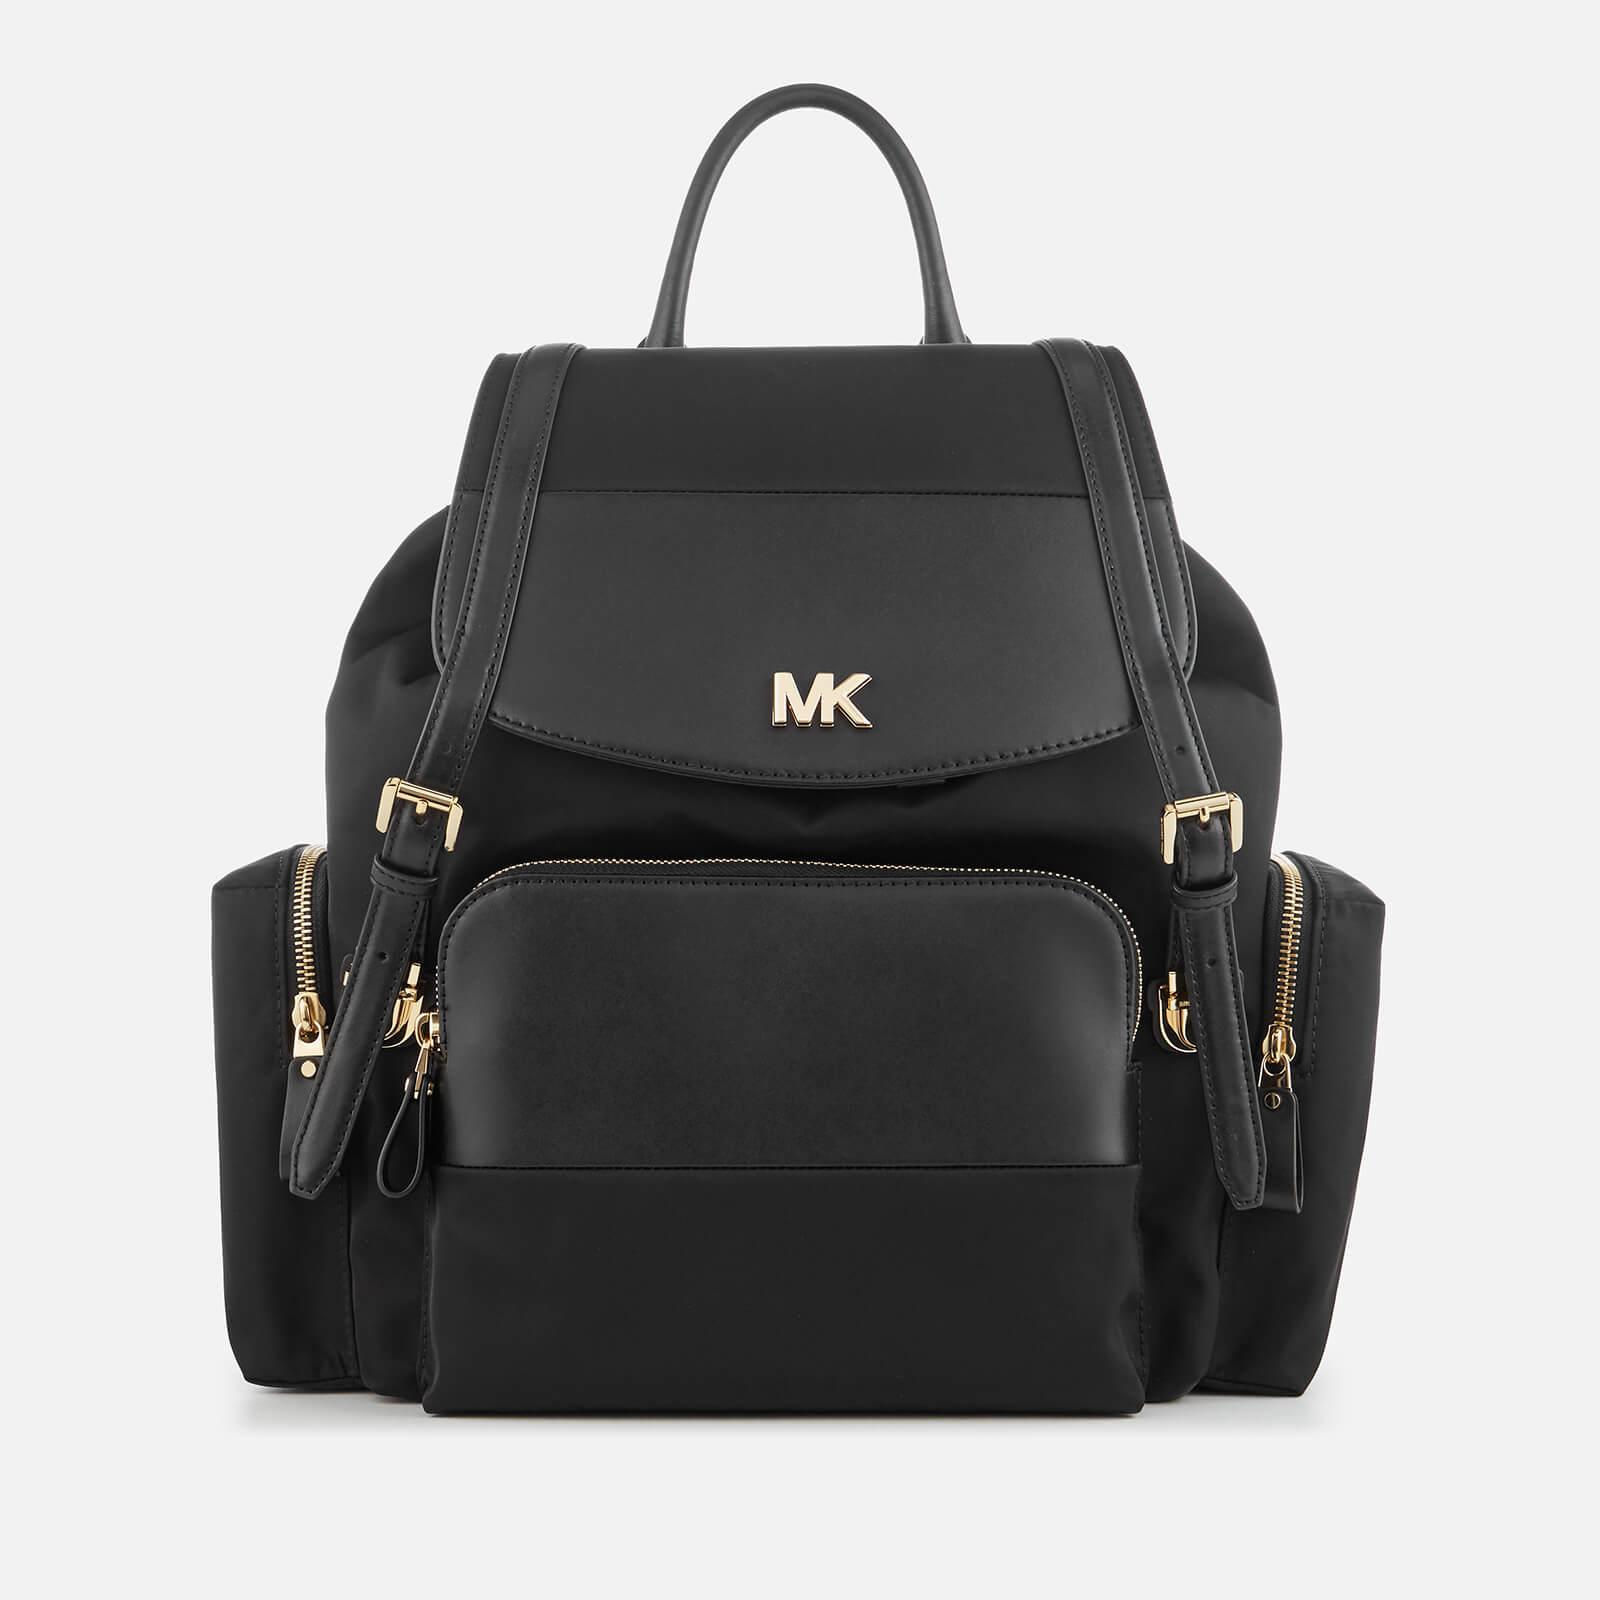 fcea7c9e4b3 MICHAEL MICHAEL KORS Women s Mott Changing Bag Backpack - Black - Free UK  Delivery over £50